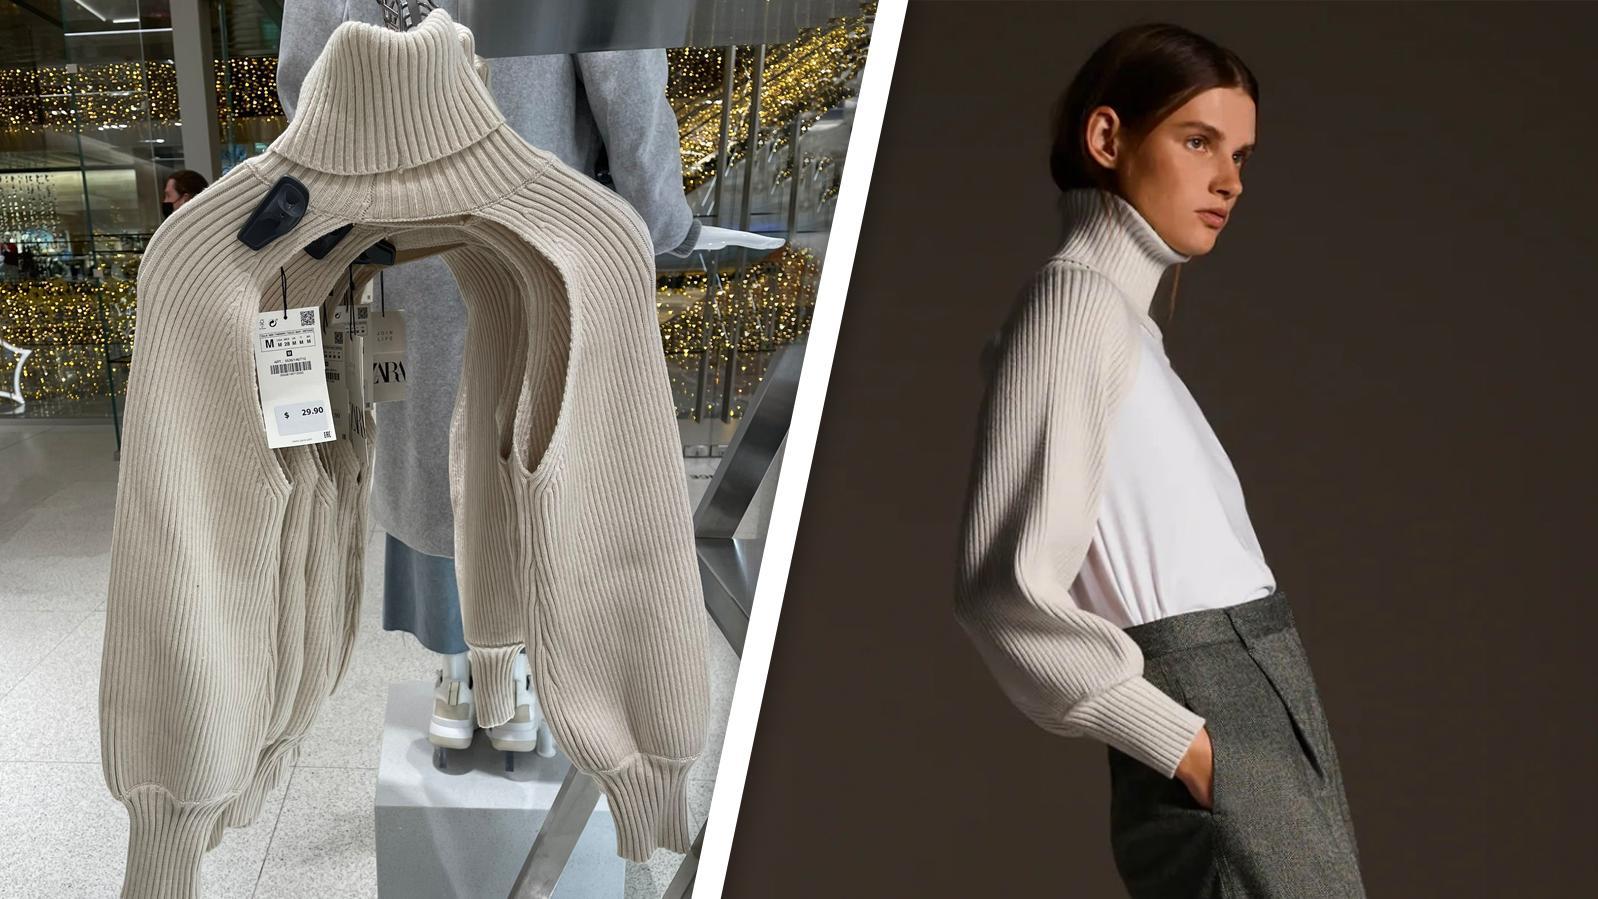 Dieses Zara-Produkt belustigt die Twitter-Gemeinde